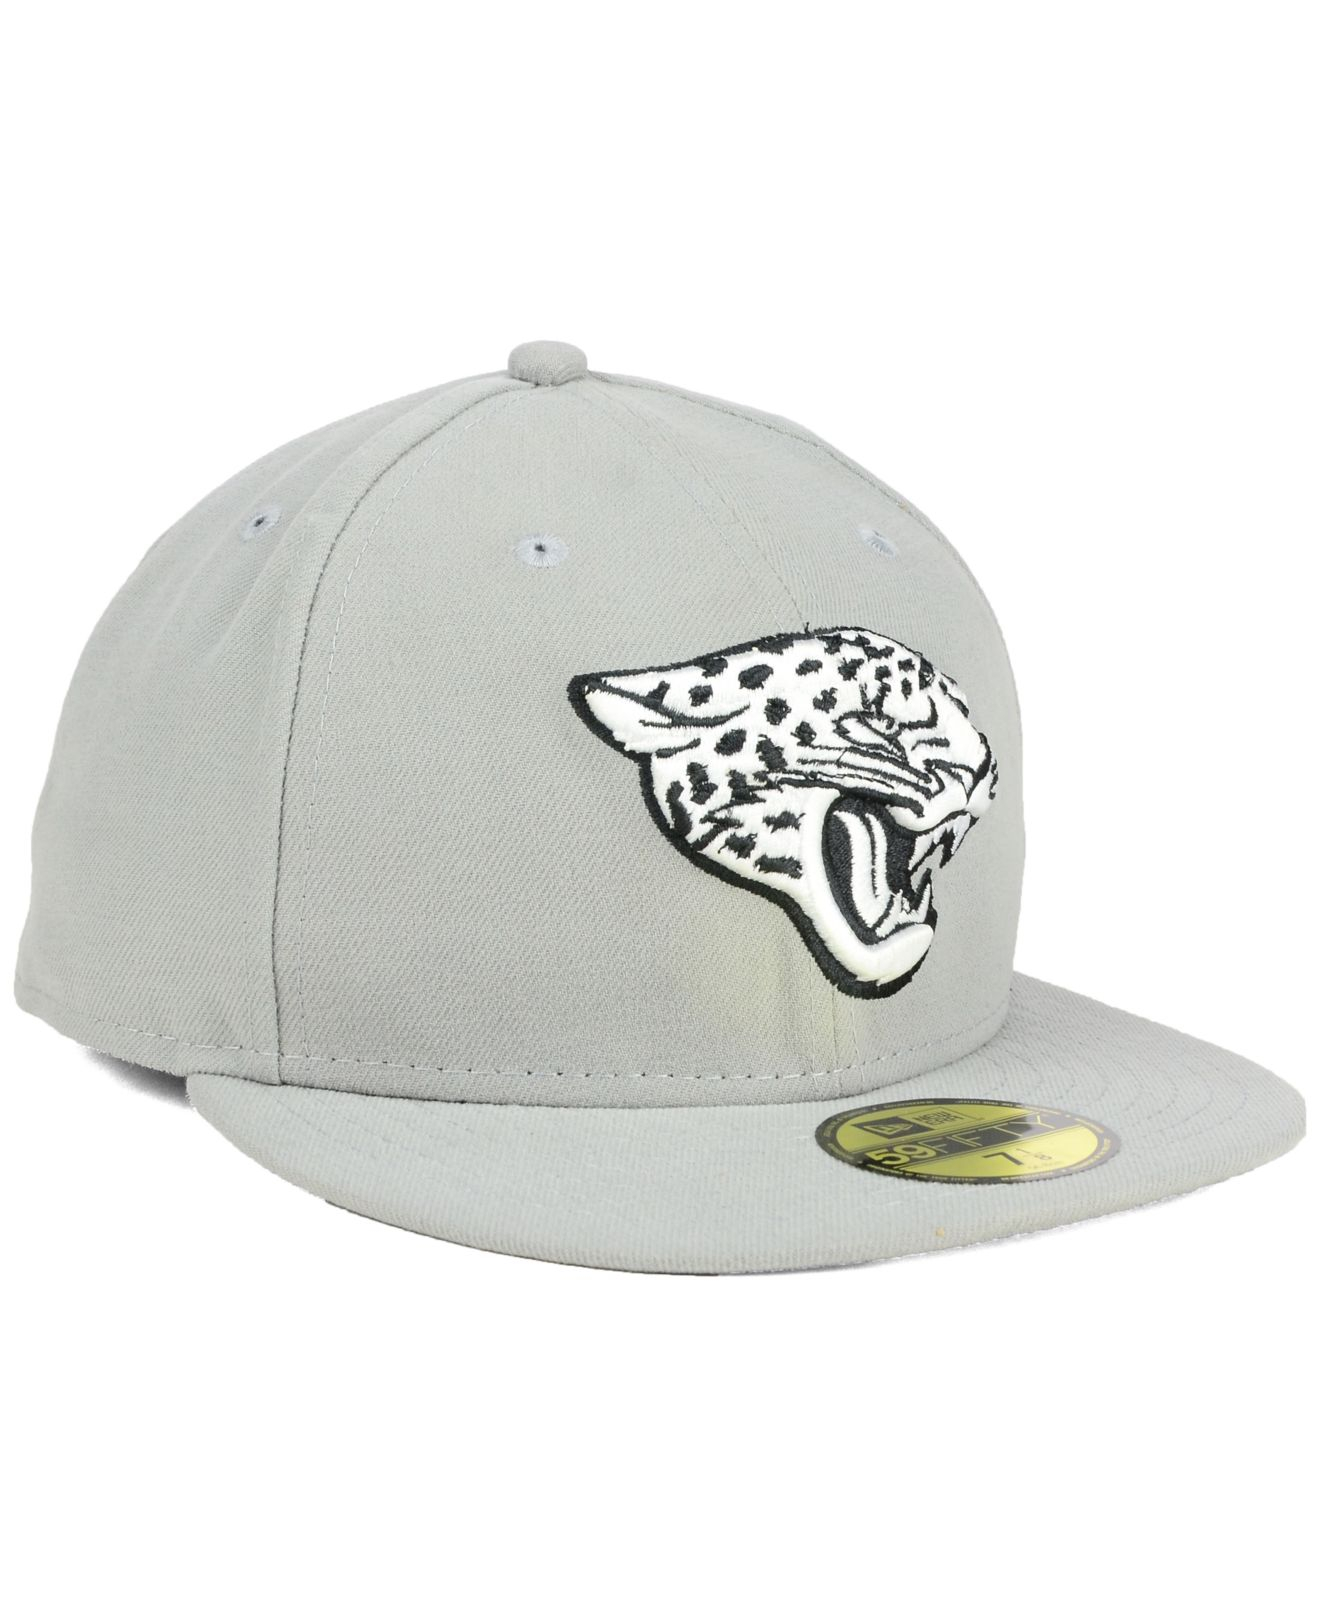 ktz jacksonville jaguars gray bw 59fifty cap in gray lyst. Black Bedroom Furniture Sets. Home Design Ideas